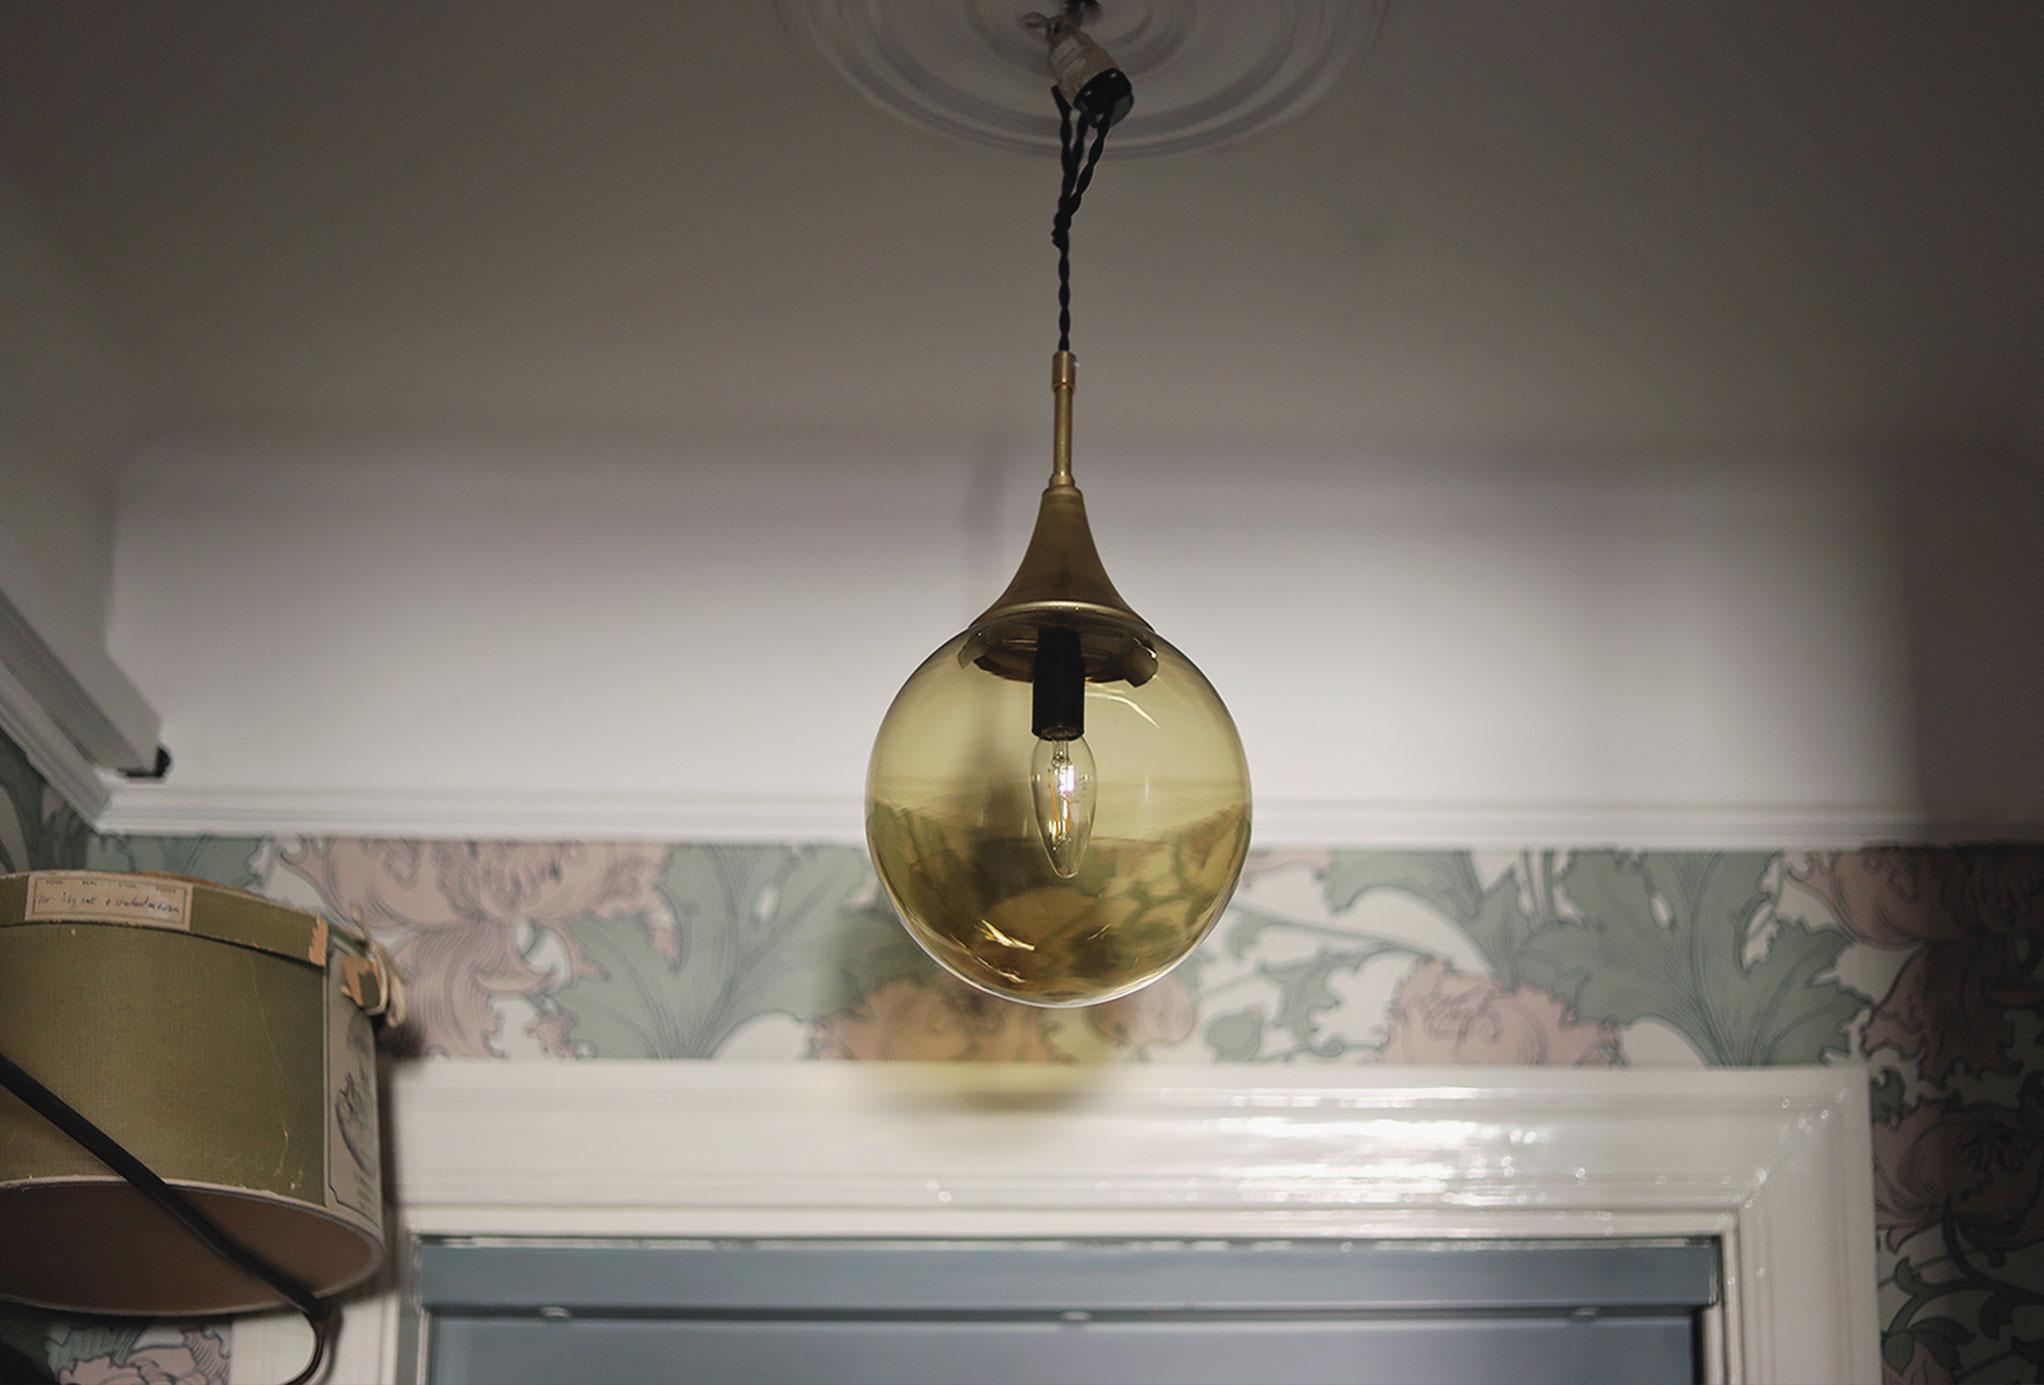 lampa vintage svenska armaturer inredning hall sekelskifte boråstapeter